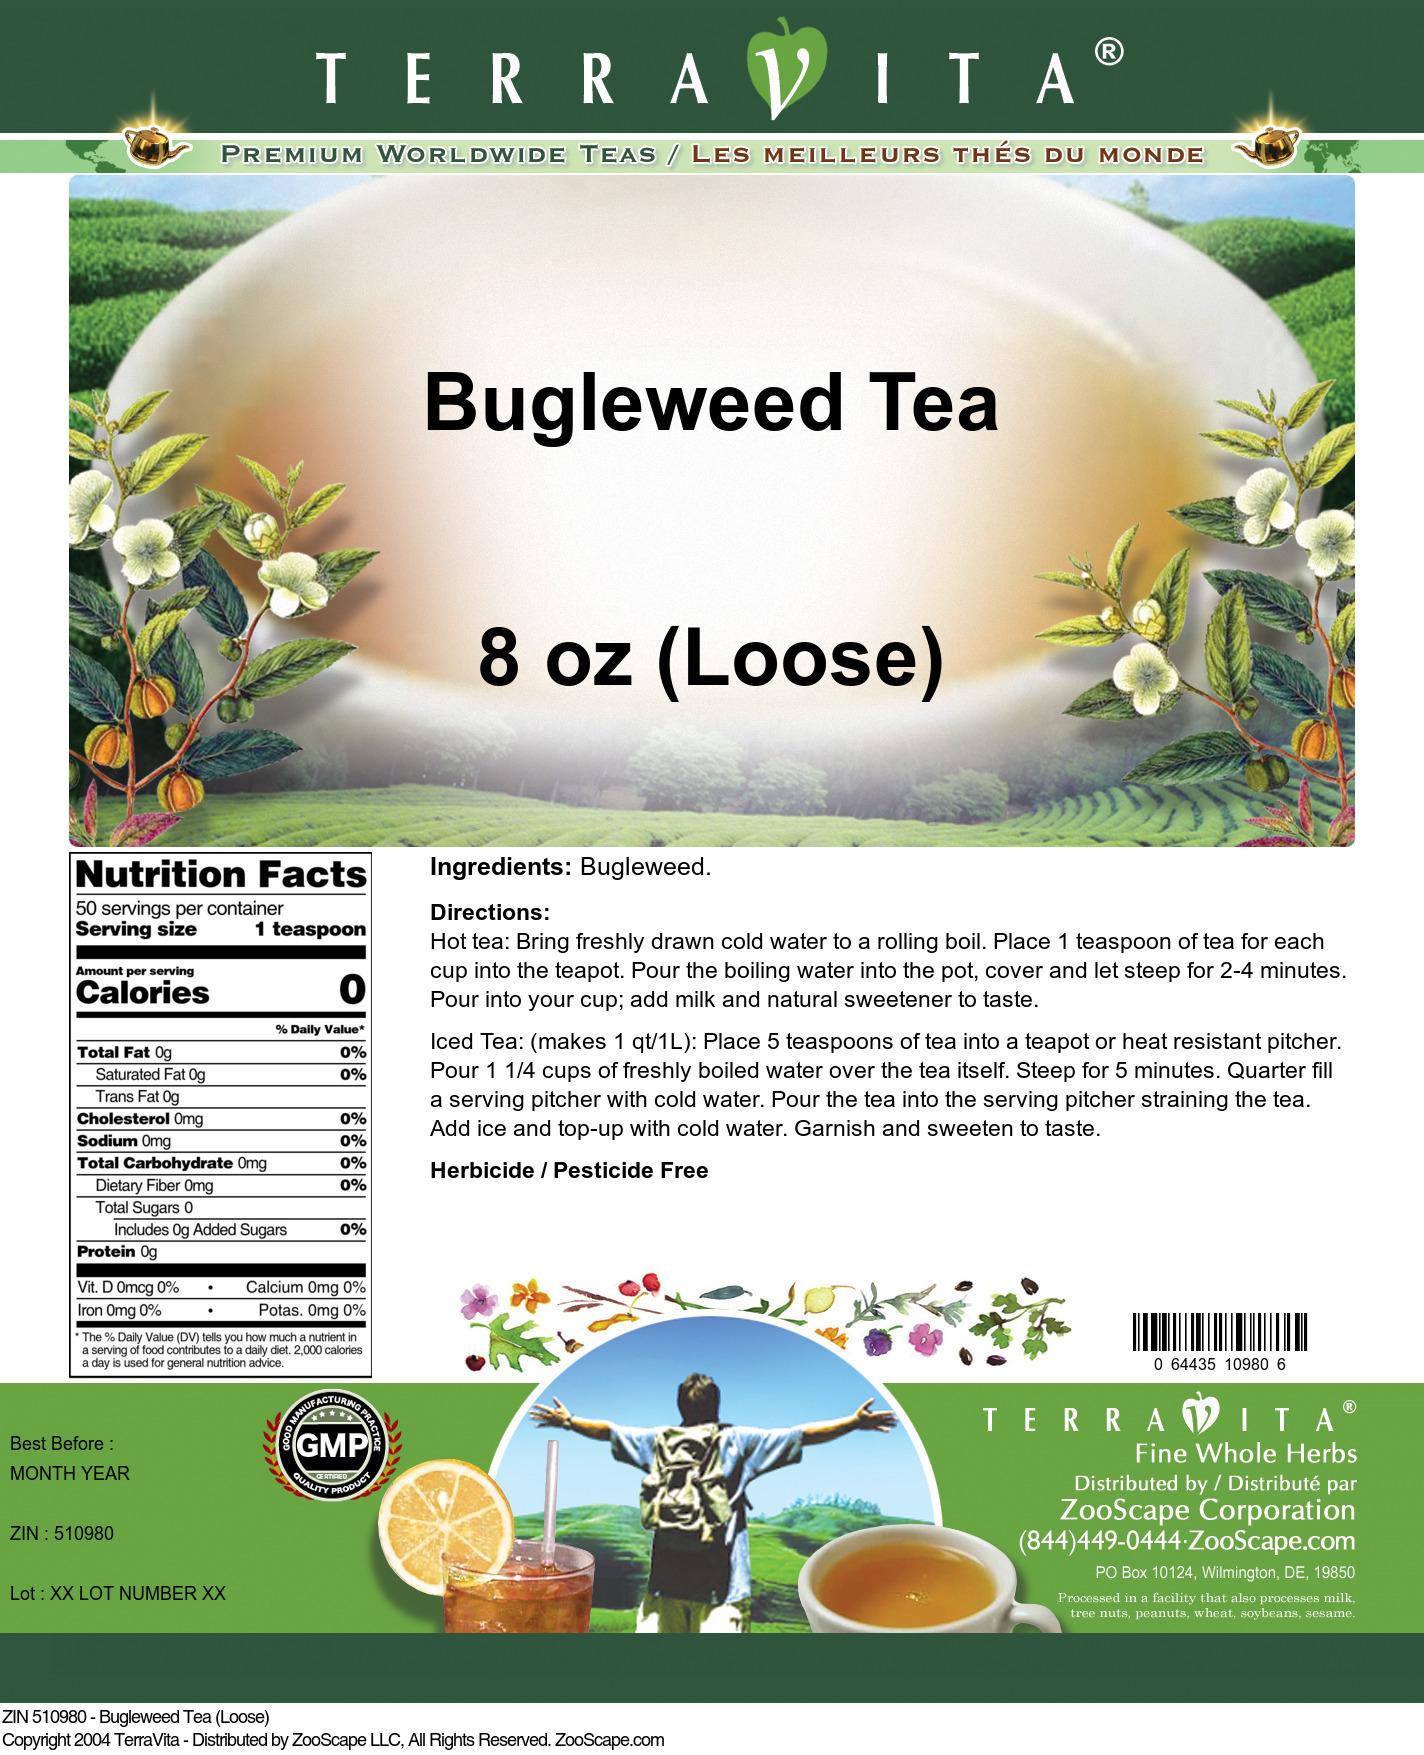 Bugleweed Tea (Loose)